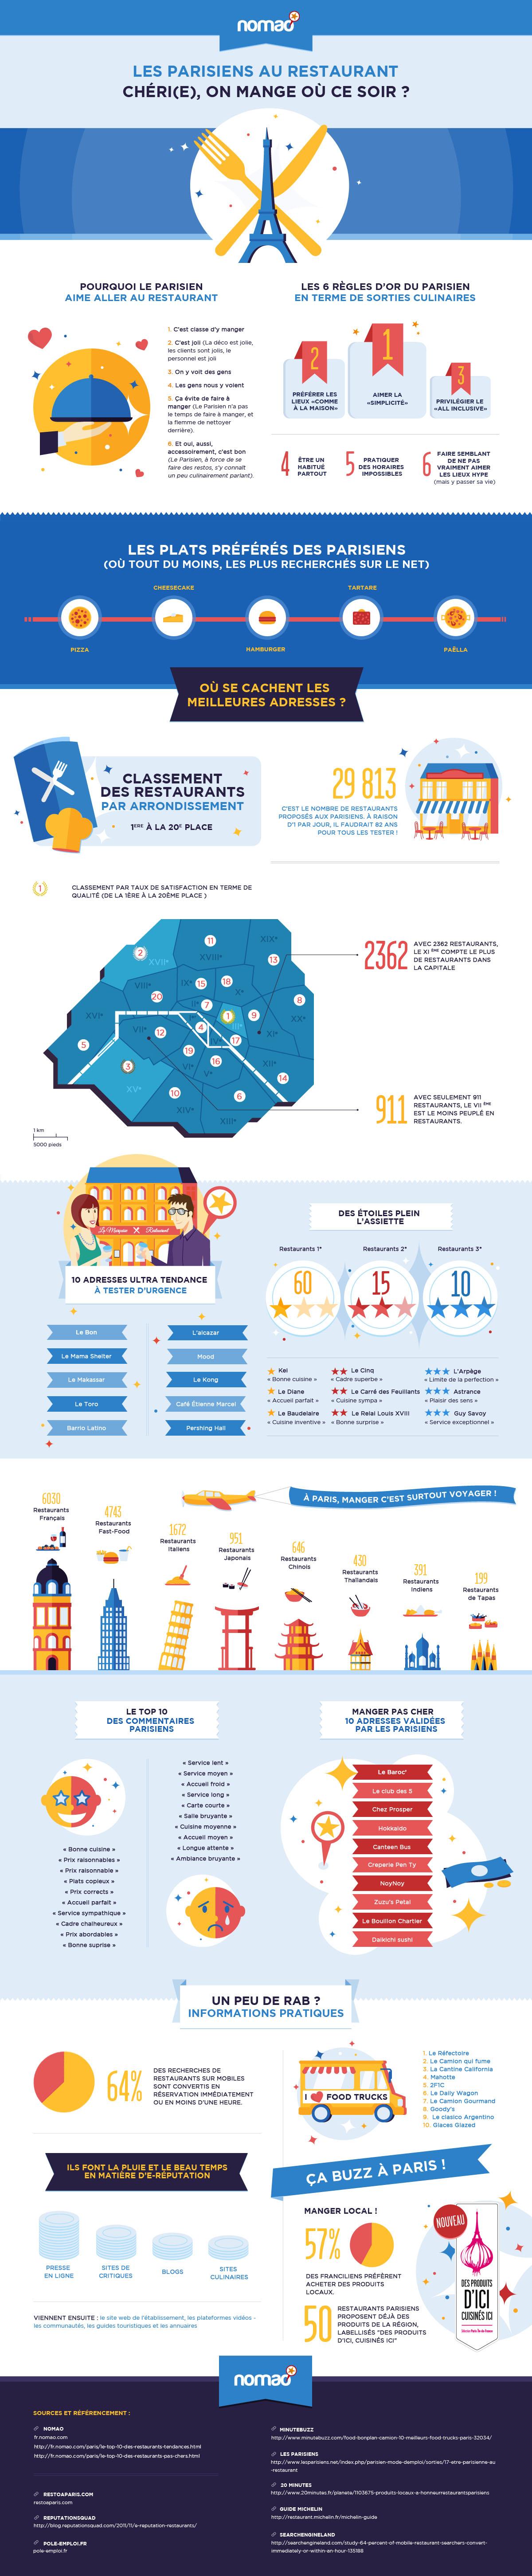 infographie-restaurant-paris